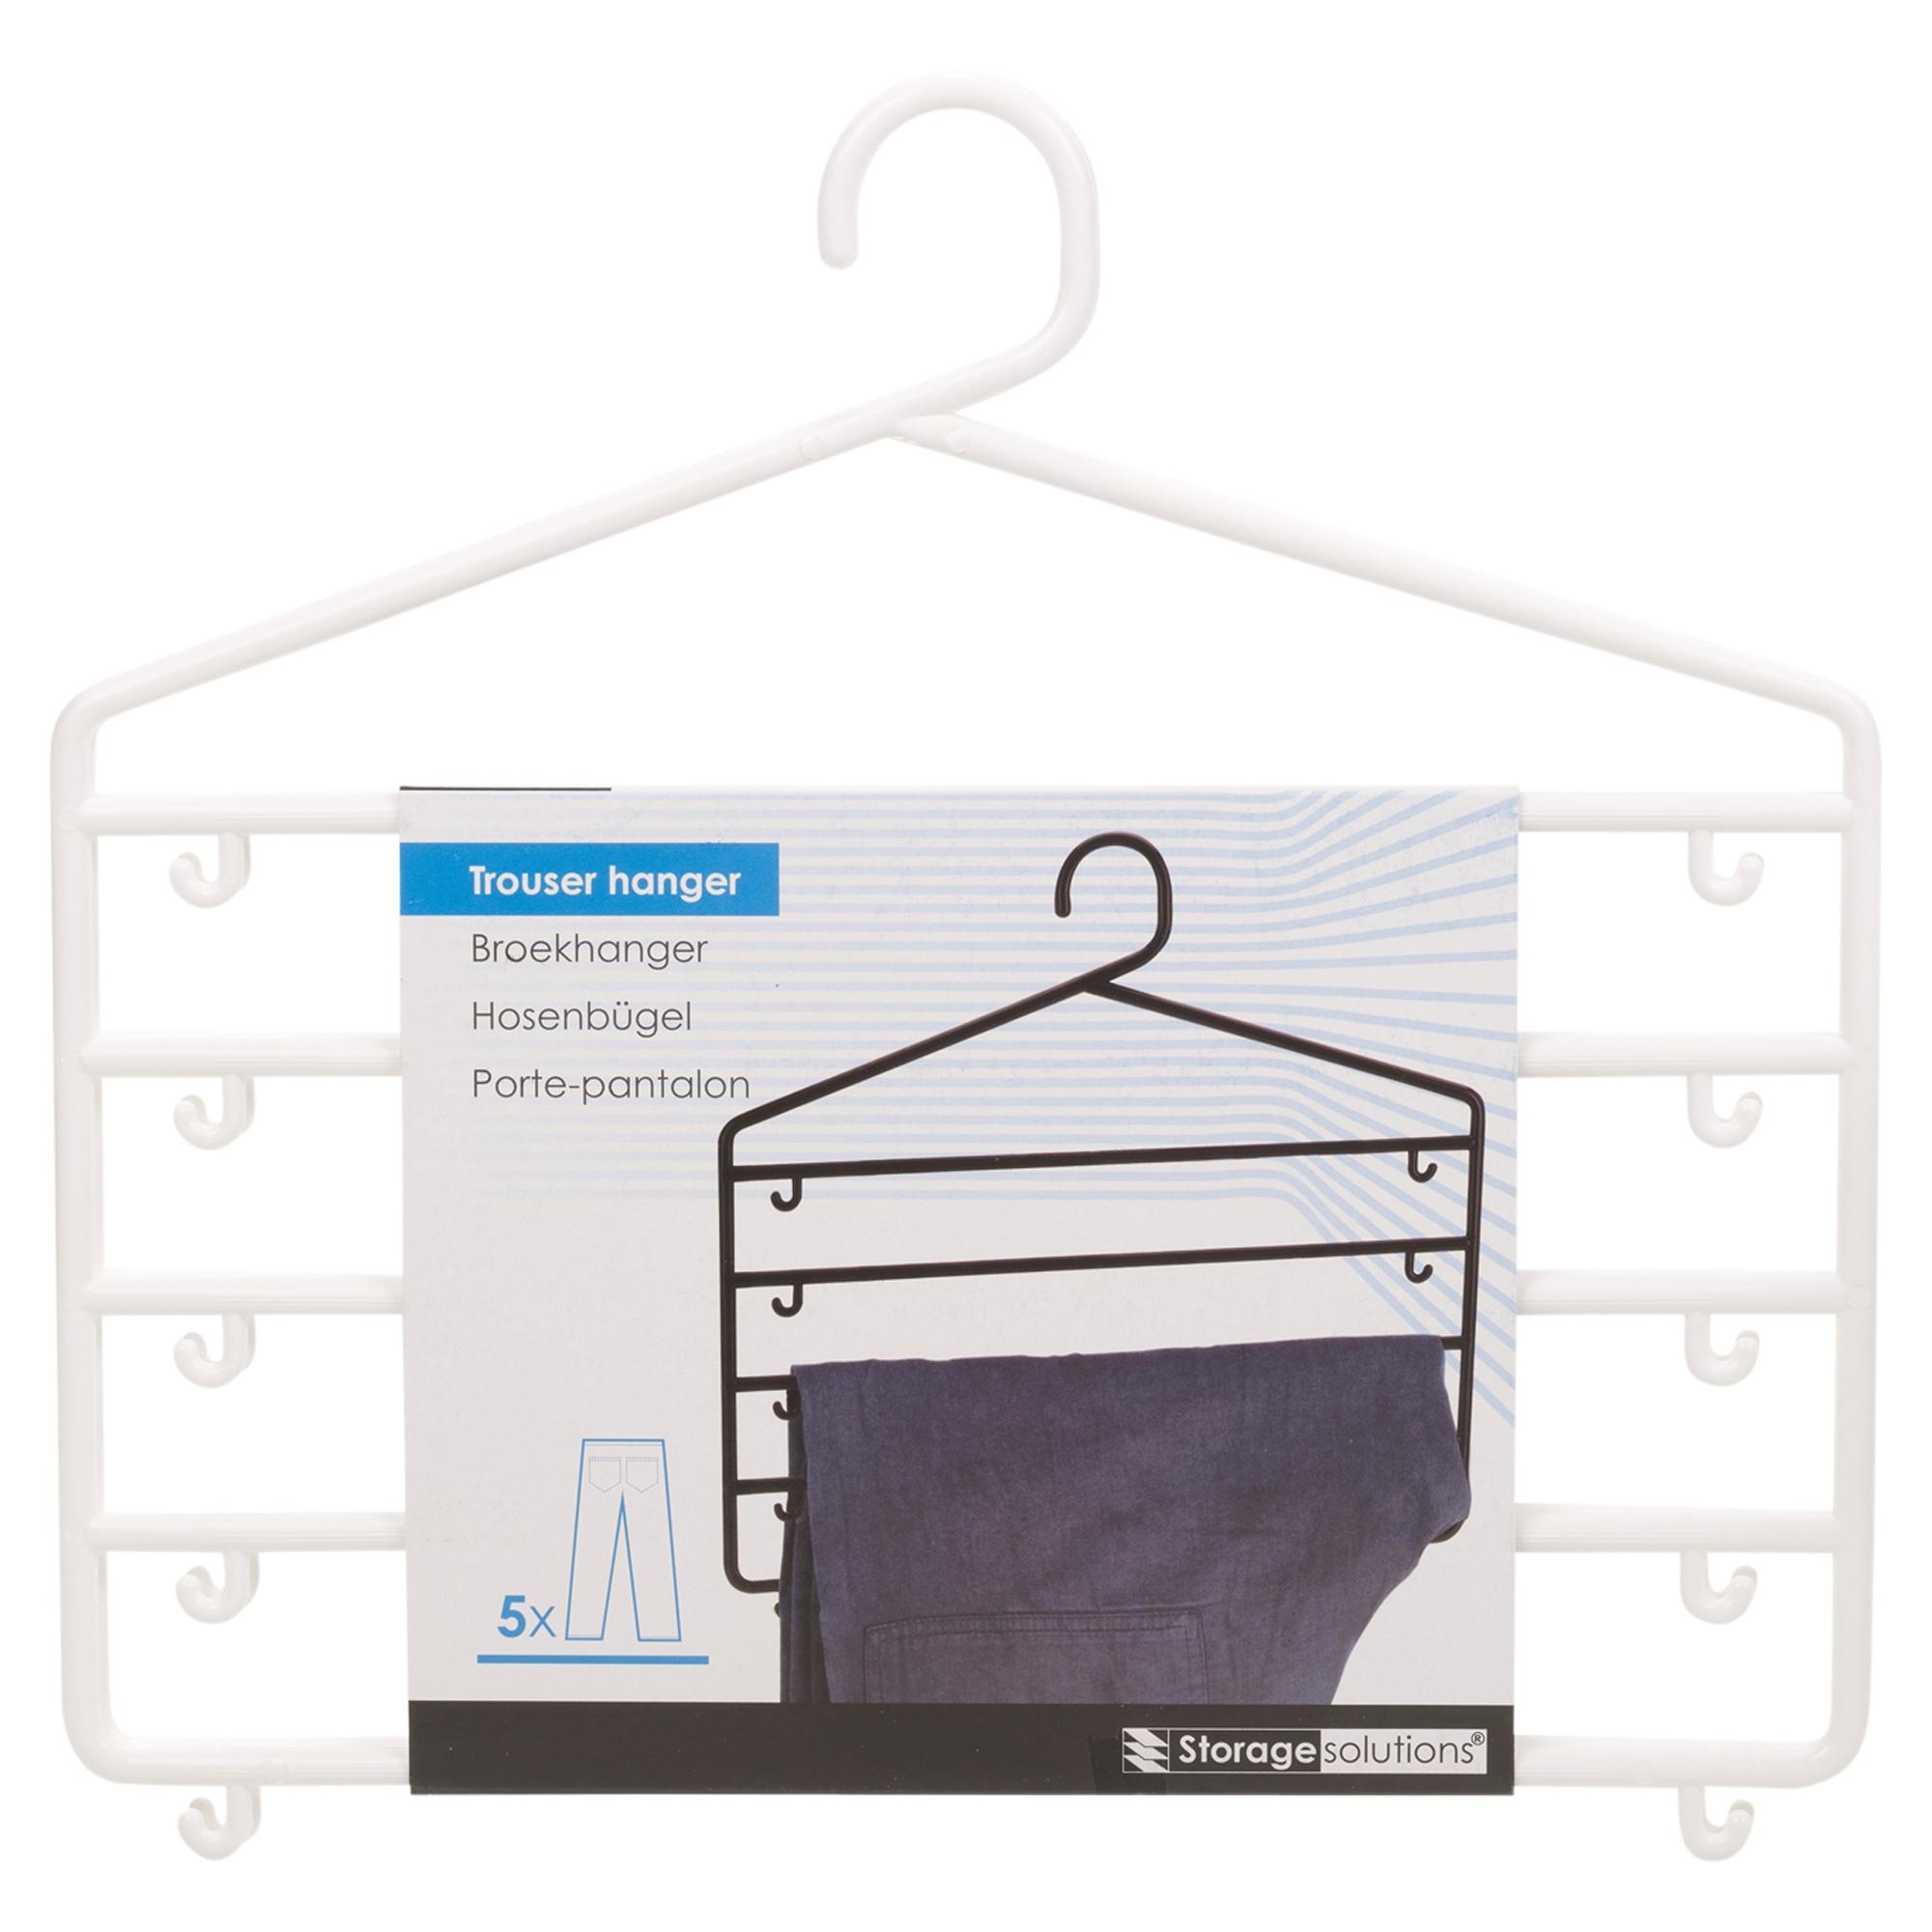 qualit t plastik 5 bar hose aufh nger kleiderschrank ordnen von lager ordentlich ebay. Black Bedroom Furniture Sets. Home Design Ideas